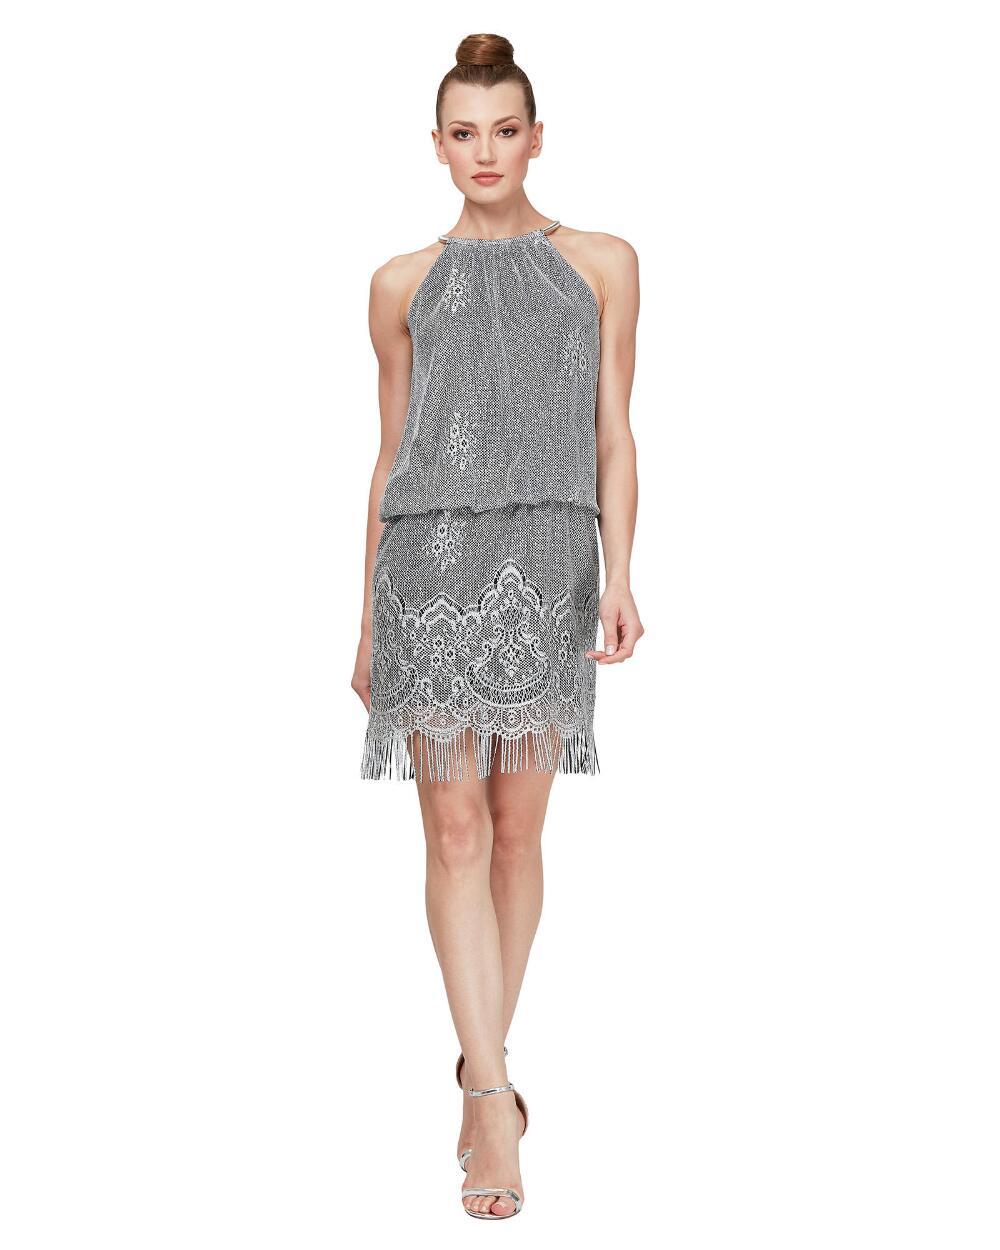 Blouson Glitter Crochet Mini Dress Stein Mart Necklines For Dresses Dresses Crochet Mini Dress [ 1250 x 1000 Pixel ]